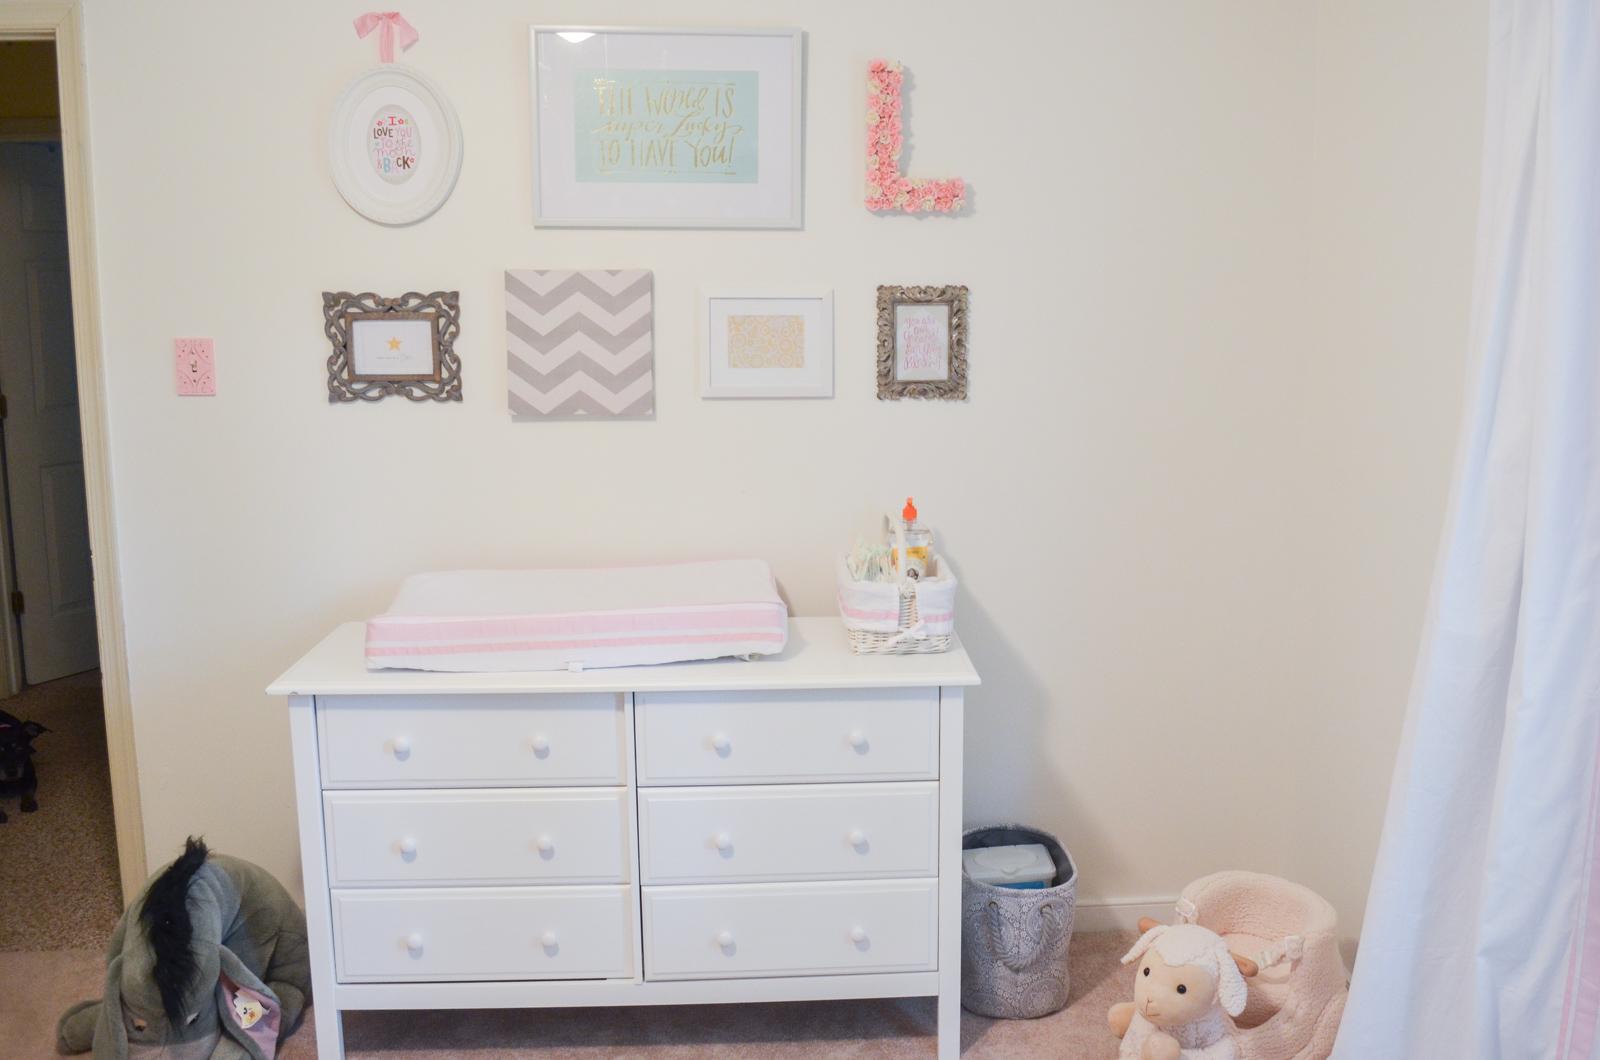 pink, grey, and white nursery - diy gallery wall nursery | bylaurenm.com